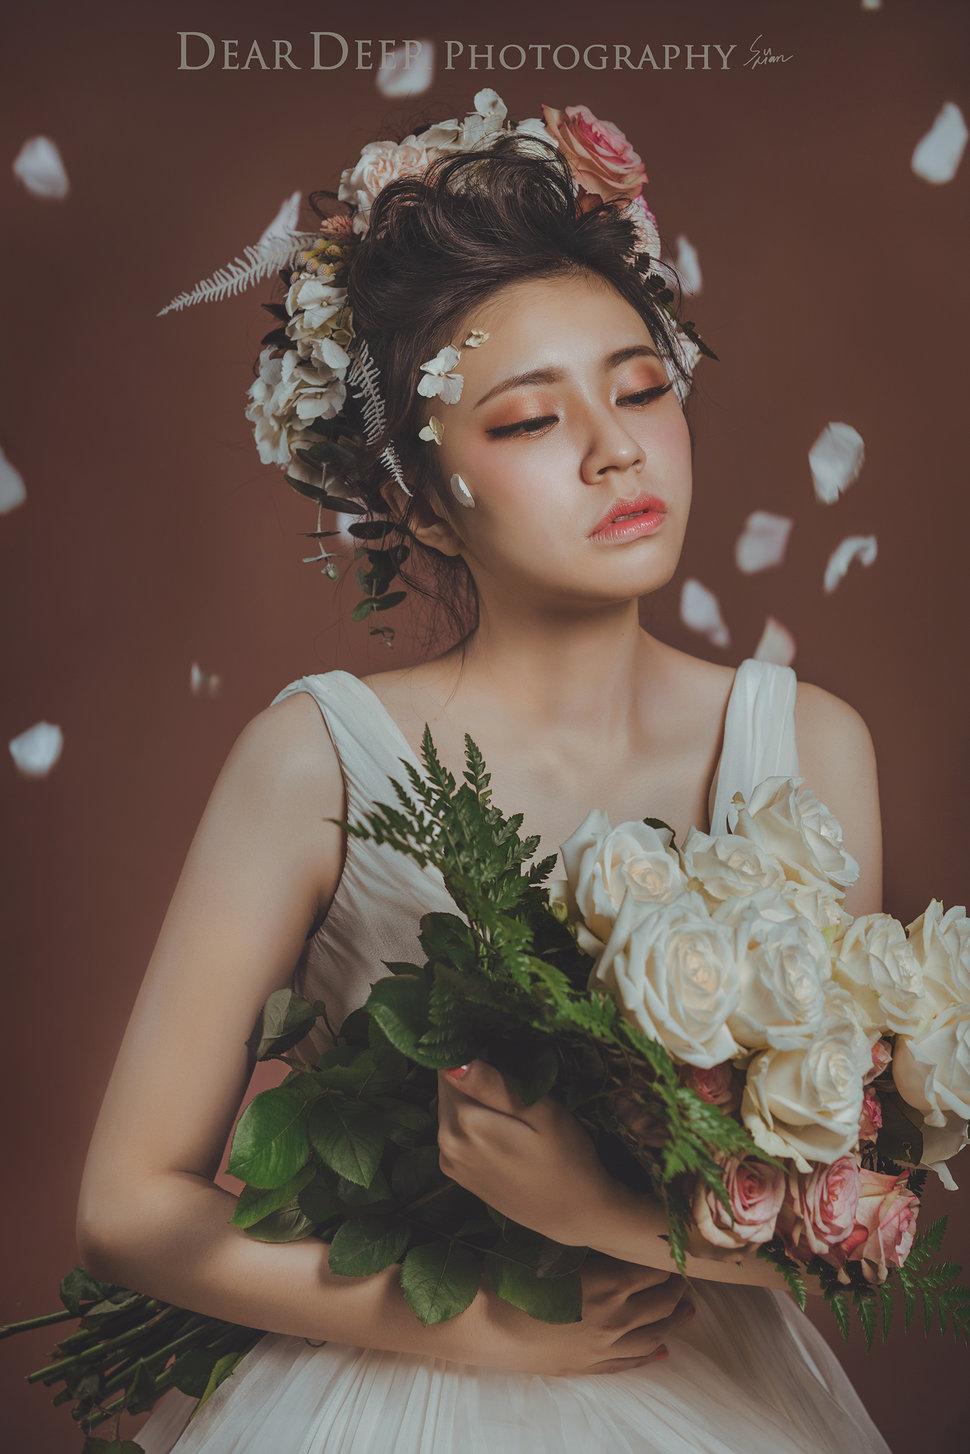 Dear Deer 夢幻精靈風格(編號:2977044) - Dear Deer鹿兒攝影 女攝影師蘇蔓 - 結婚吧